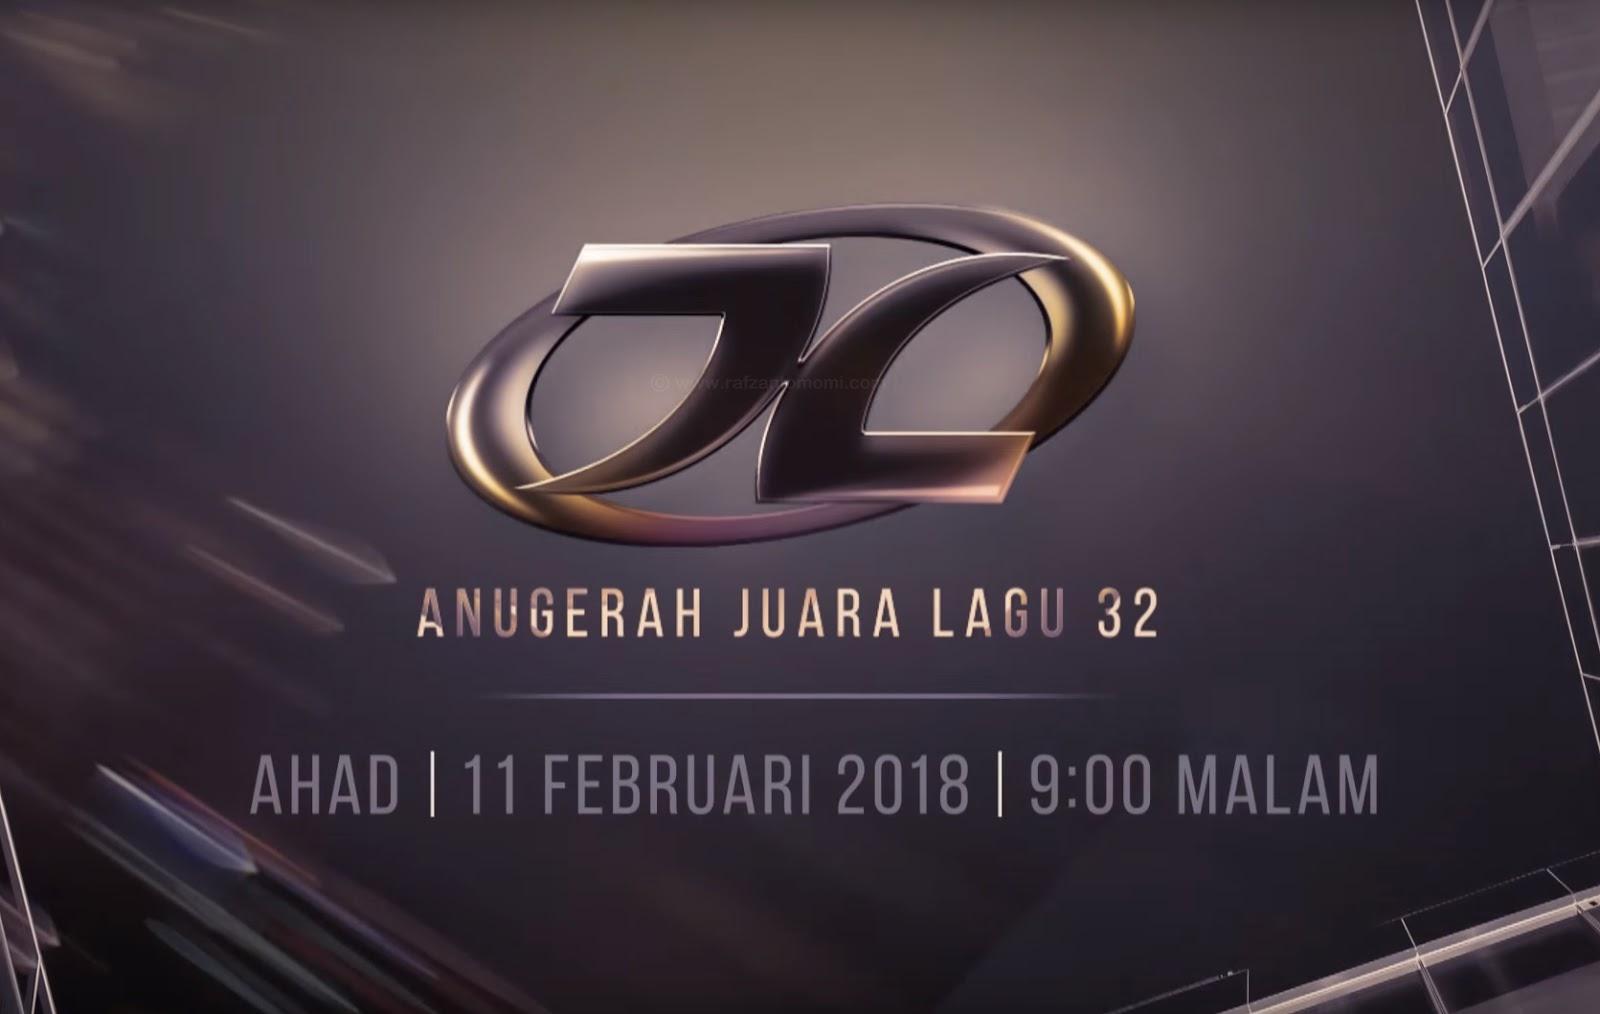 Anugerah Juara Lagu 32 (AJL 32) | Senarai Lagu & Keputusan Anugerah Juara Lagu Ke-32